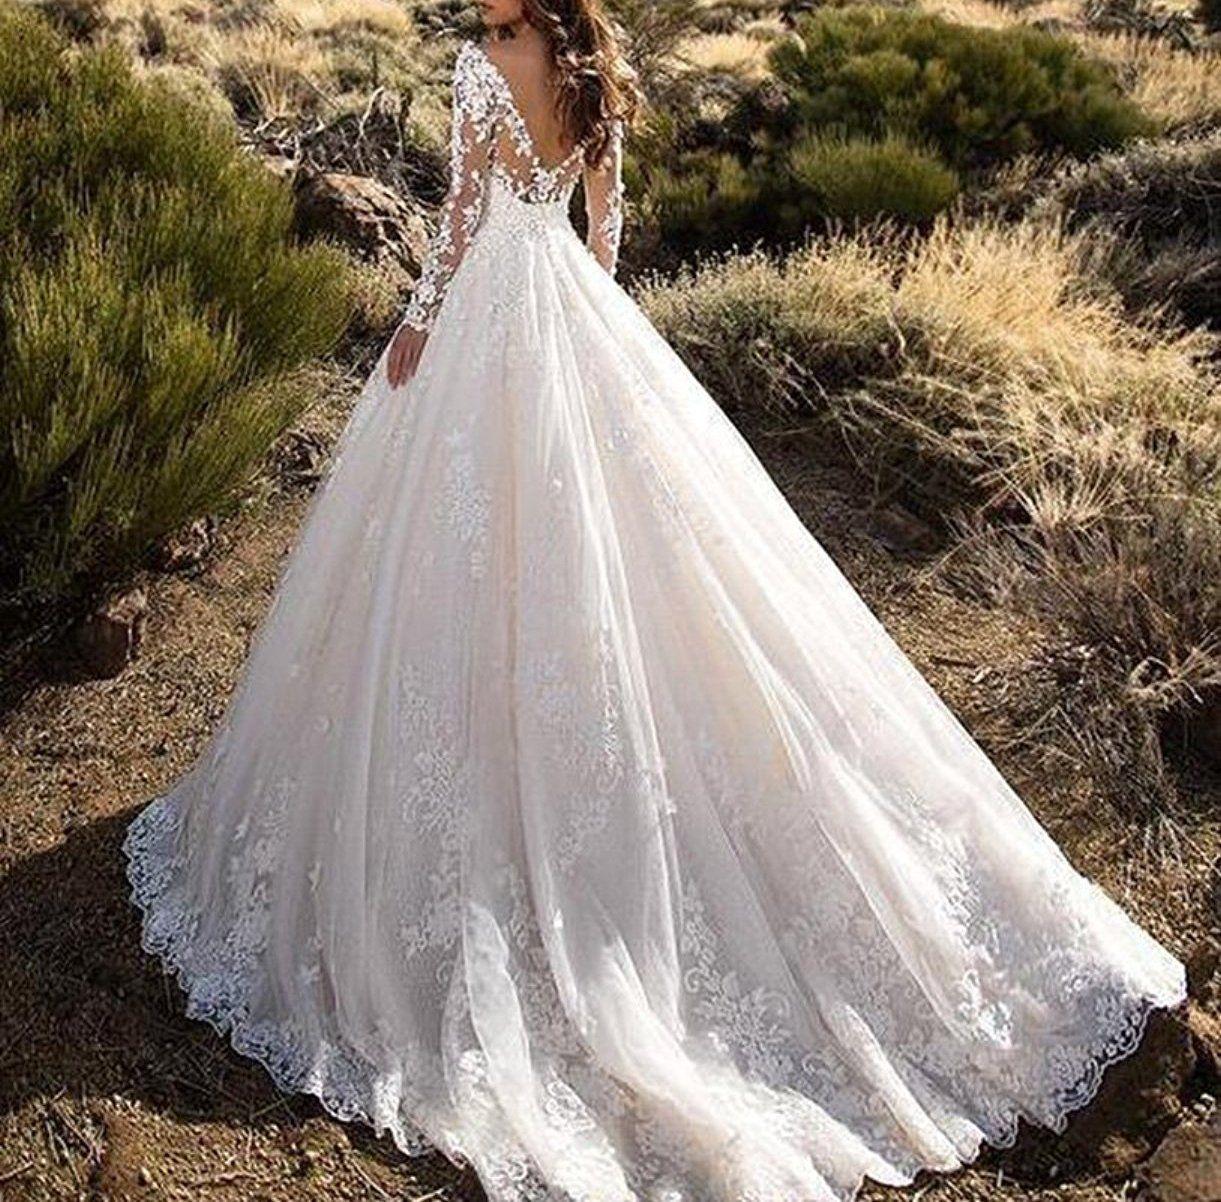 Kevins bridal double vneck lace wedding dress long sleeves ruffle